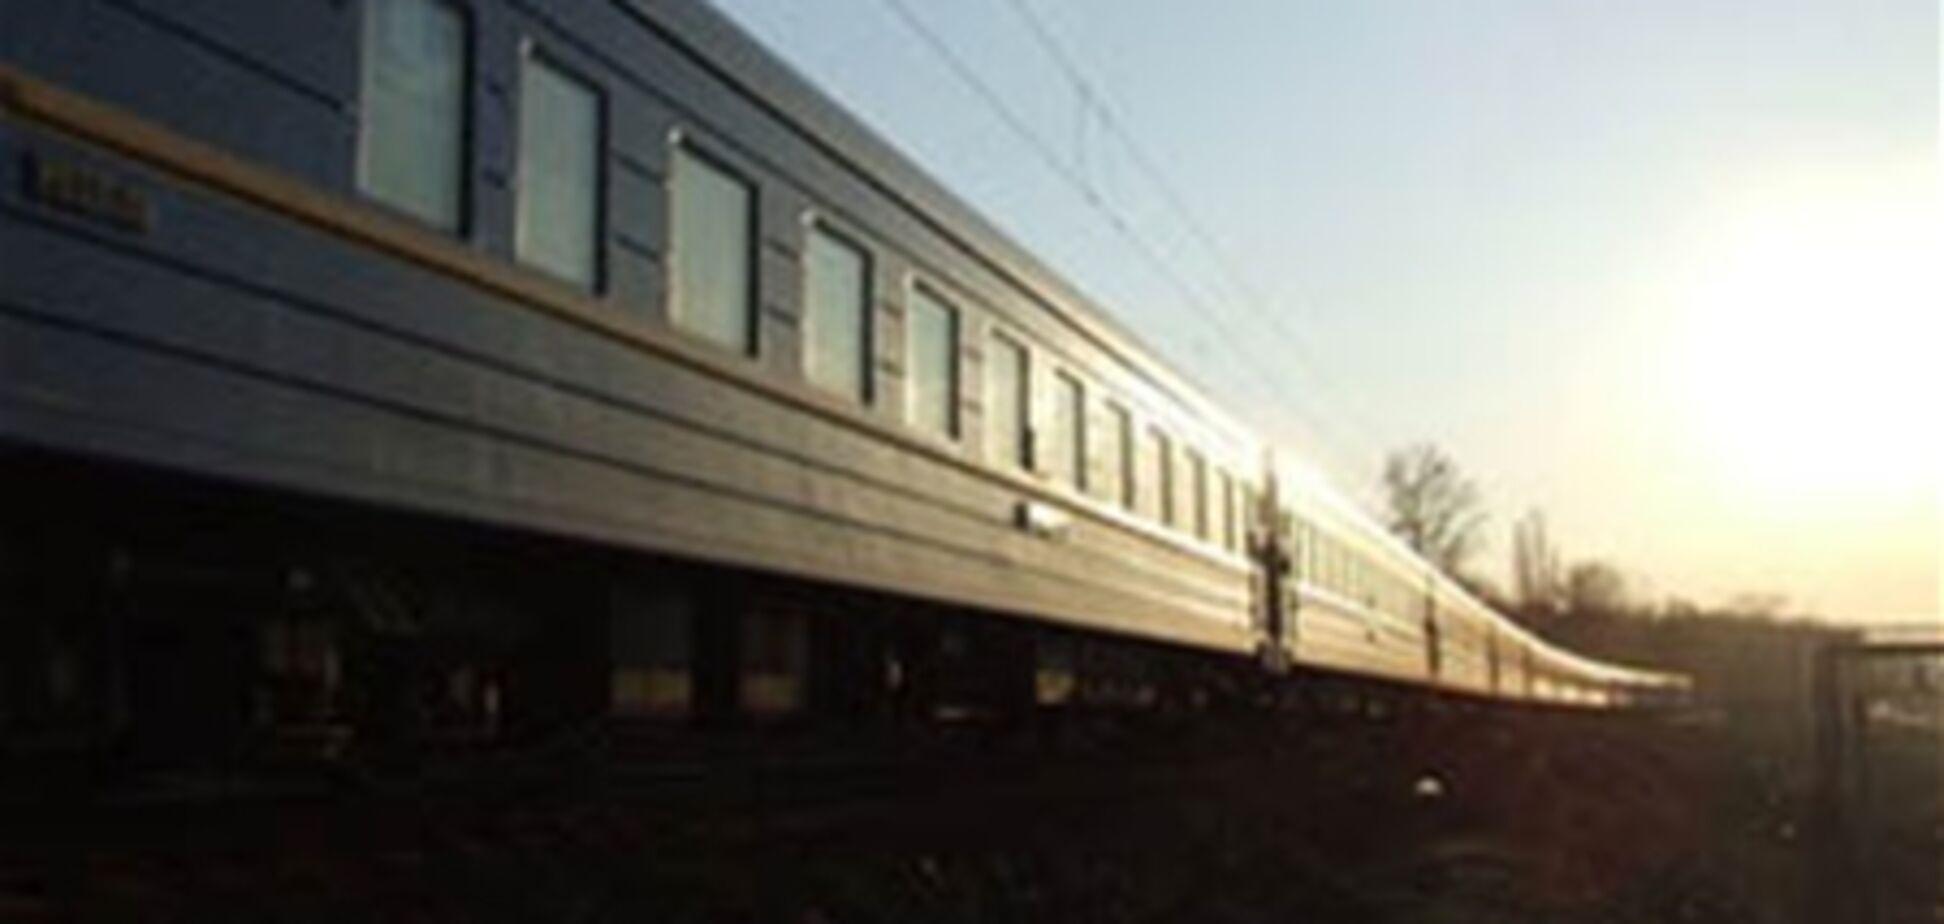 Поїзд 'Київ-Брест' задавив двох людей